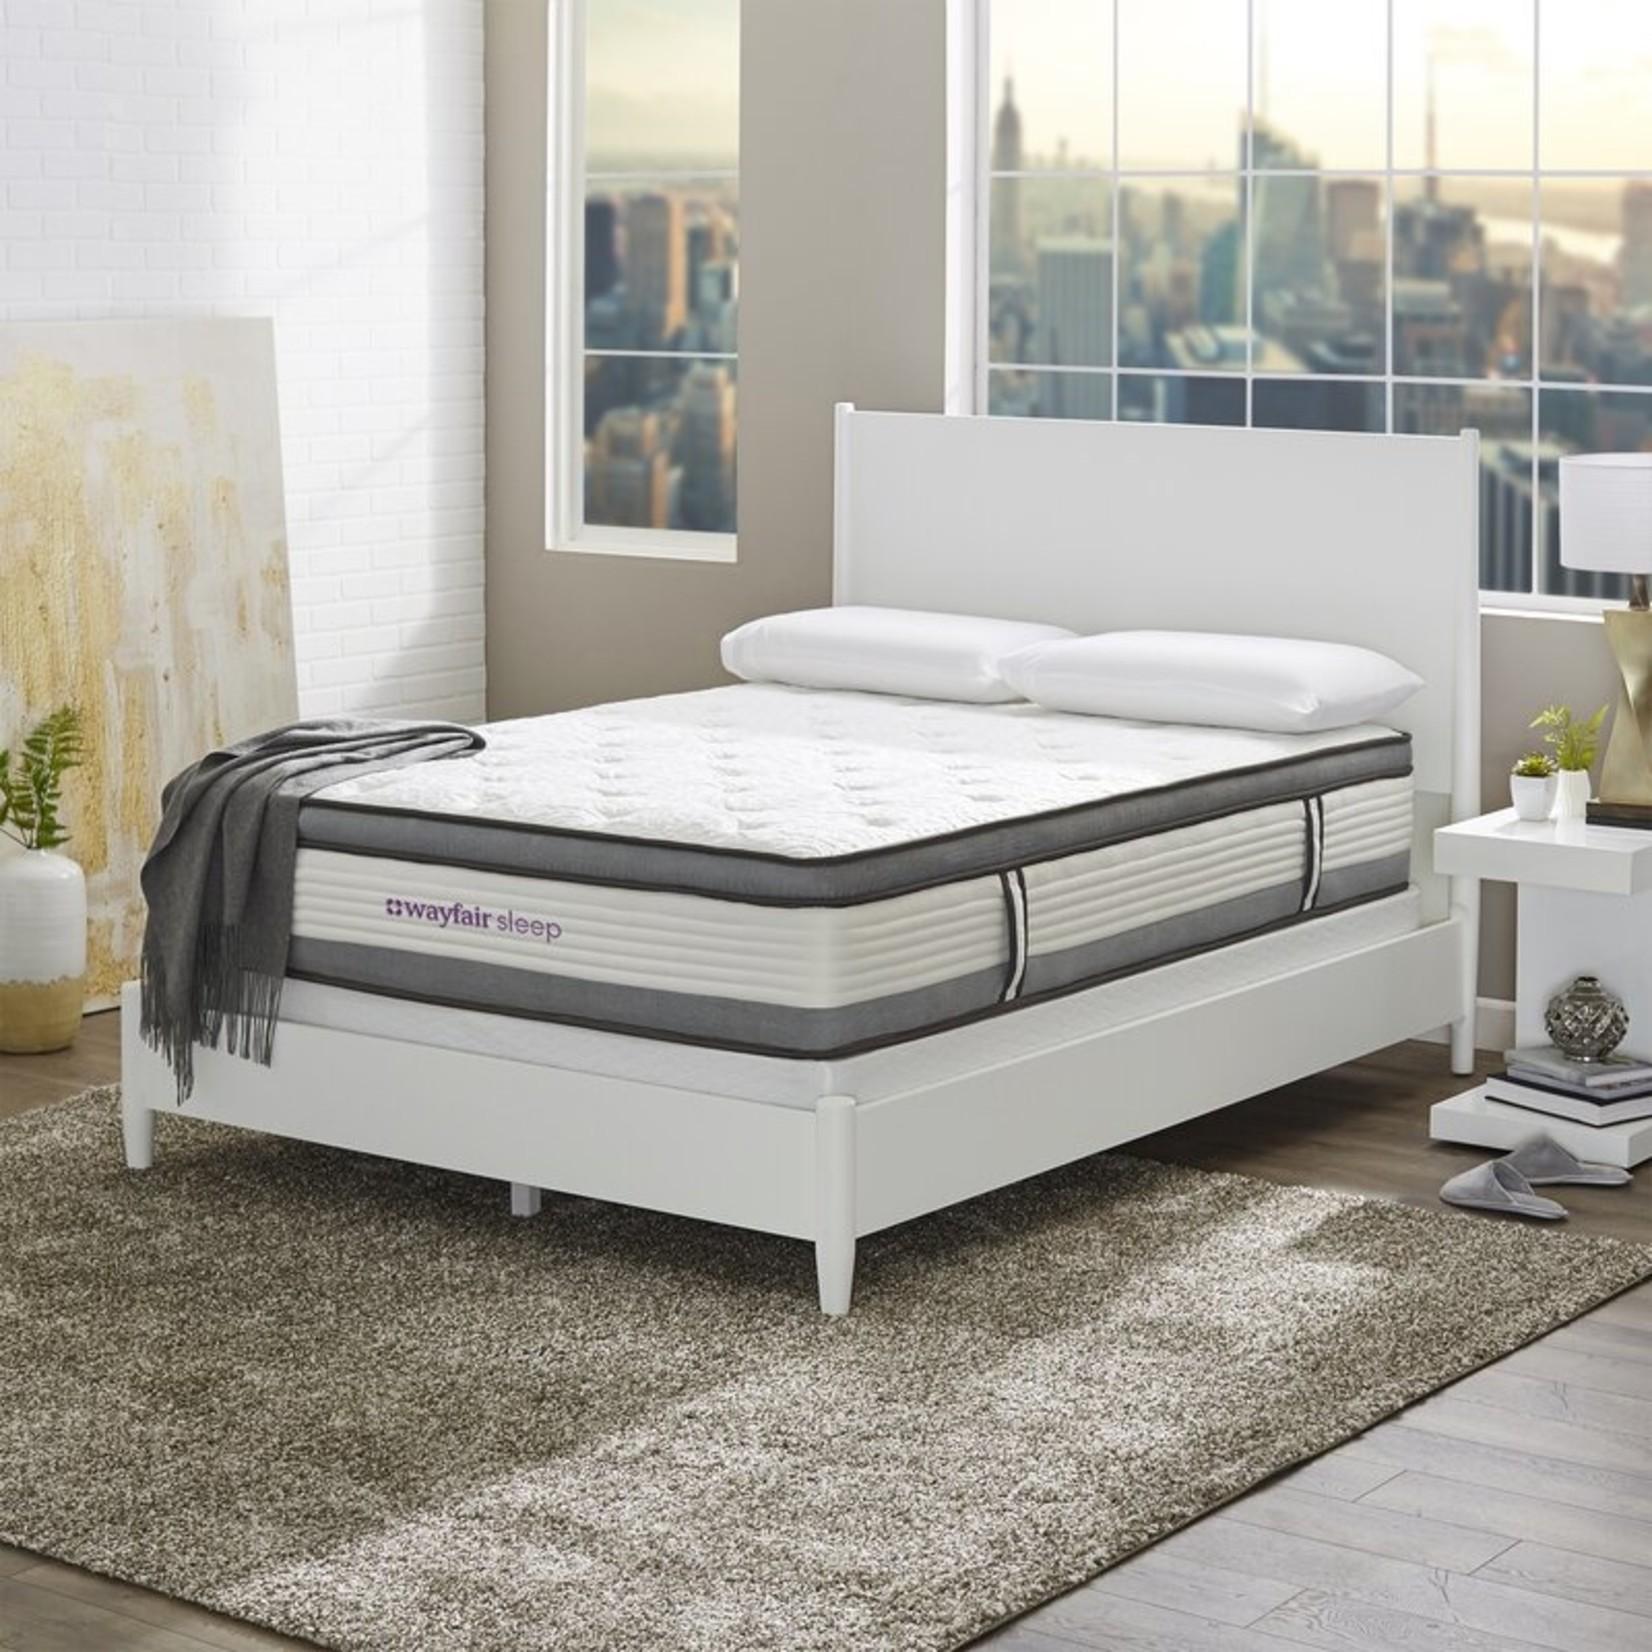 "*Full - Wayfair Sleep 12"" Medium Plush Hybrid Mattress - Final Sale"